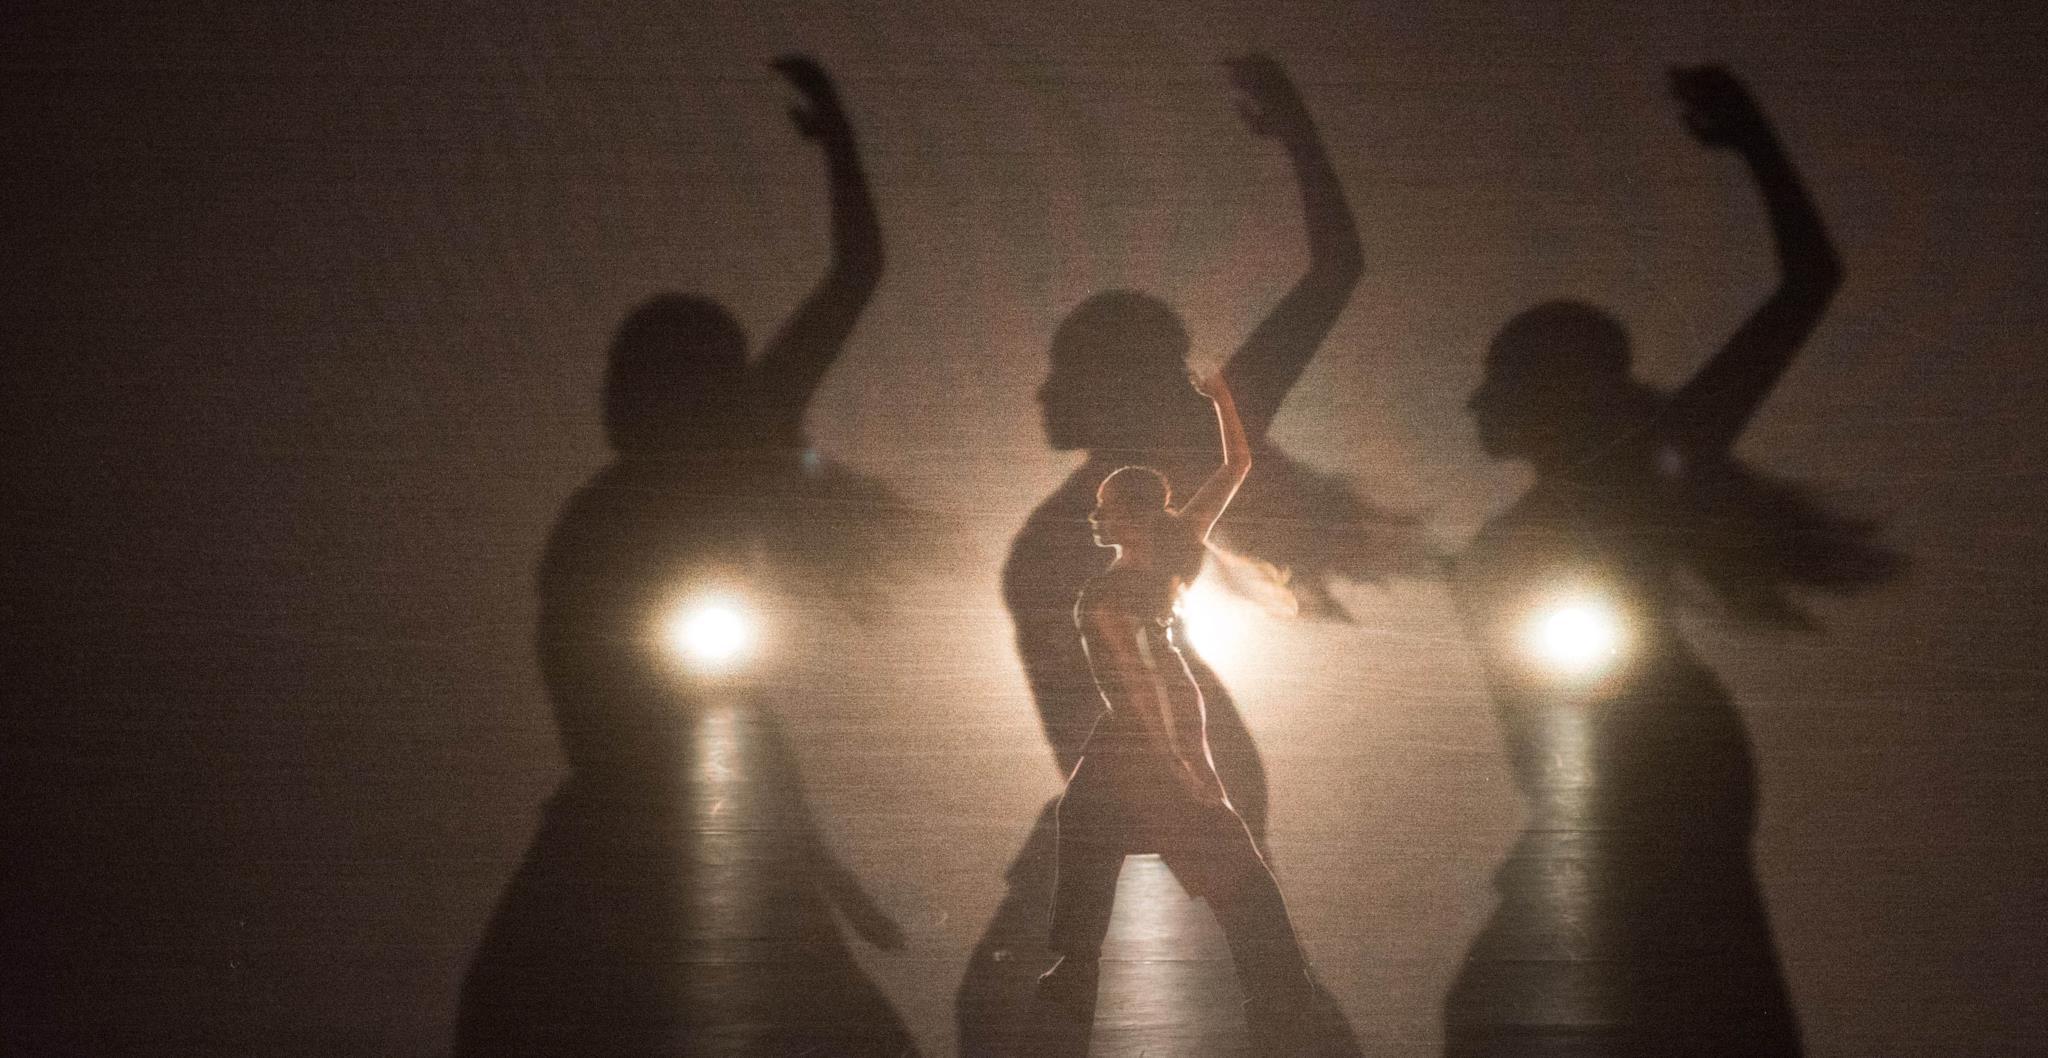 PÚBLICO - Há 20 anos que a dança de Russell Maliphant é feita de luz